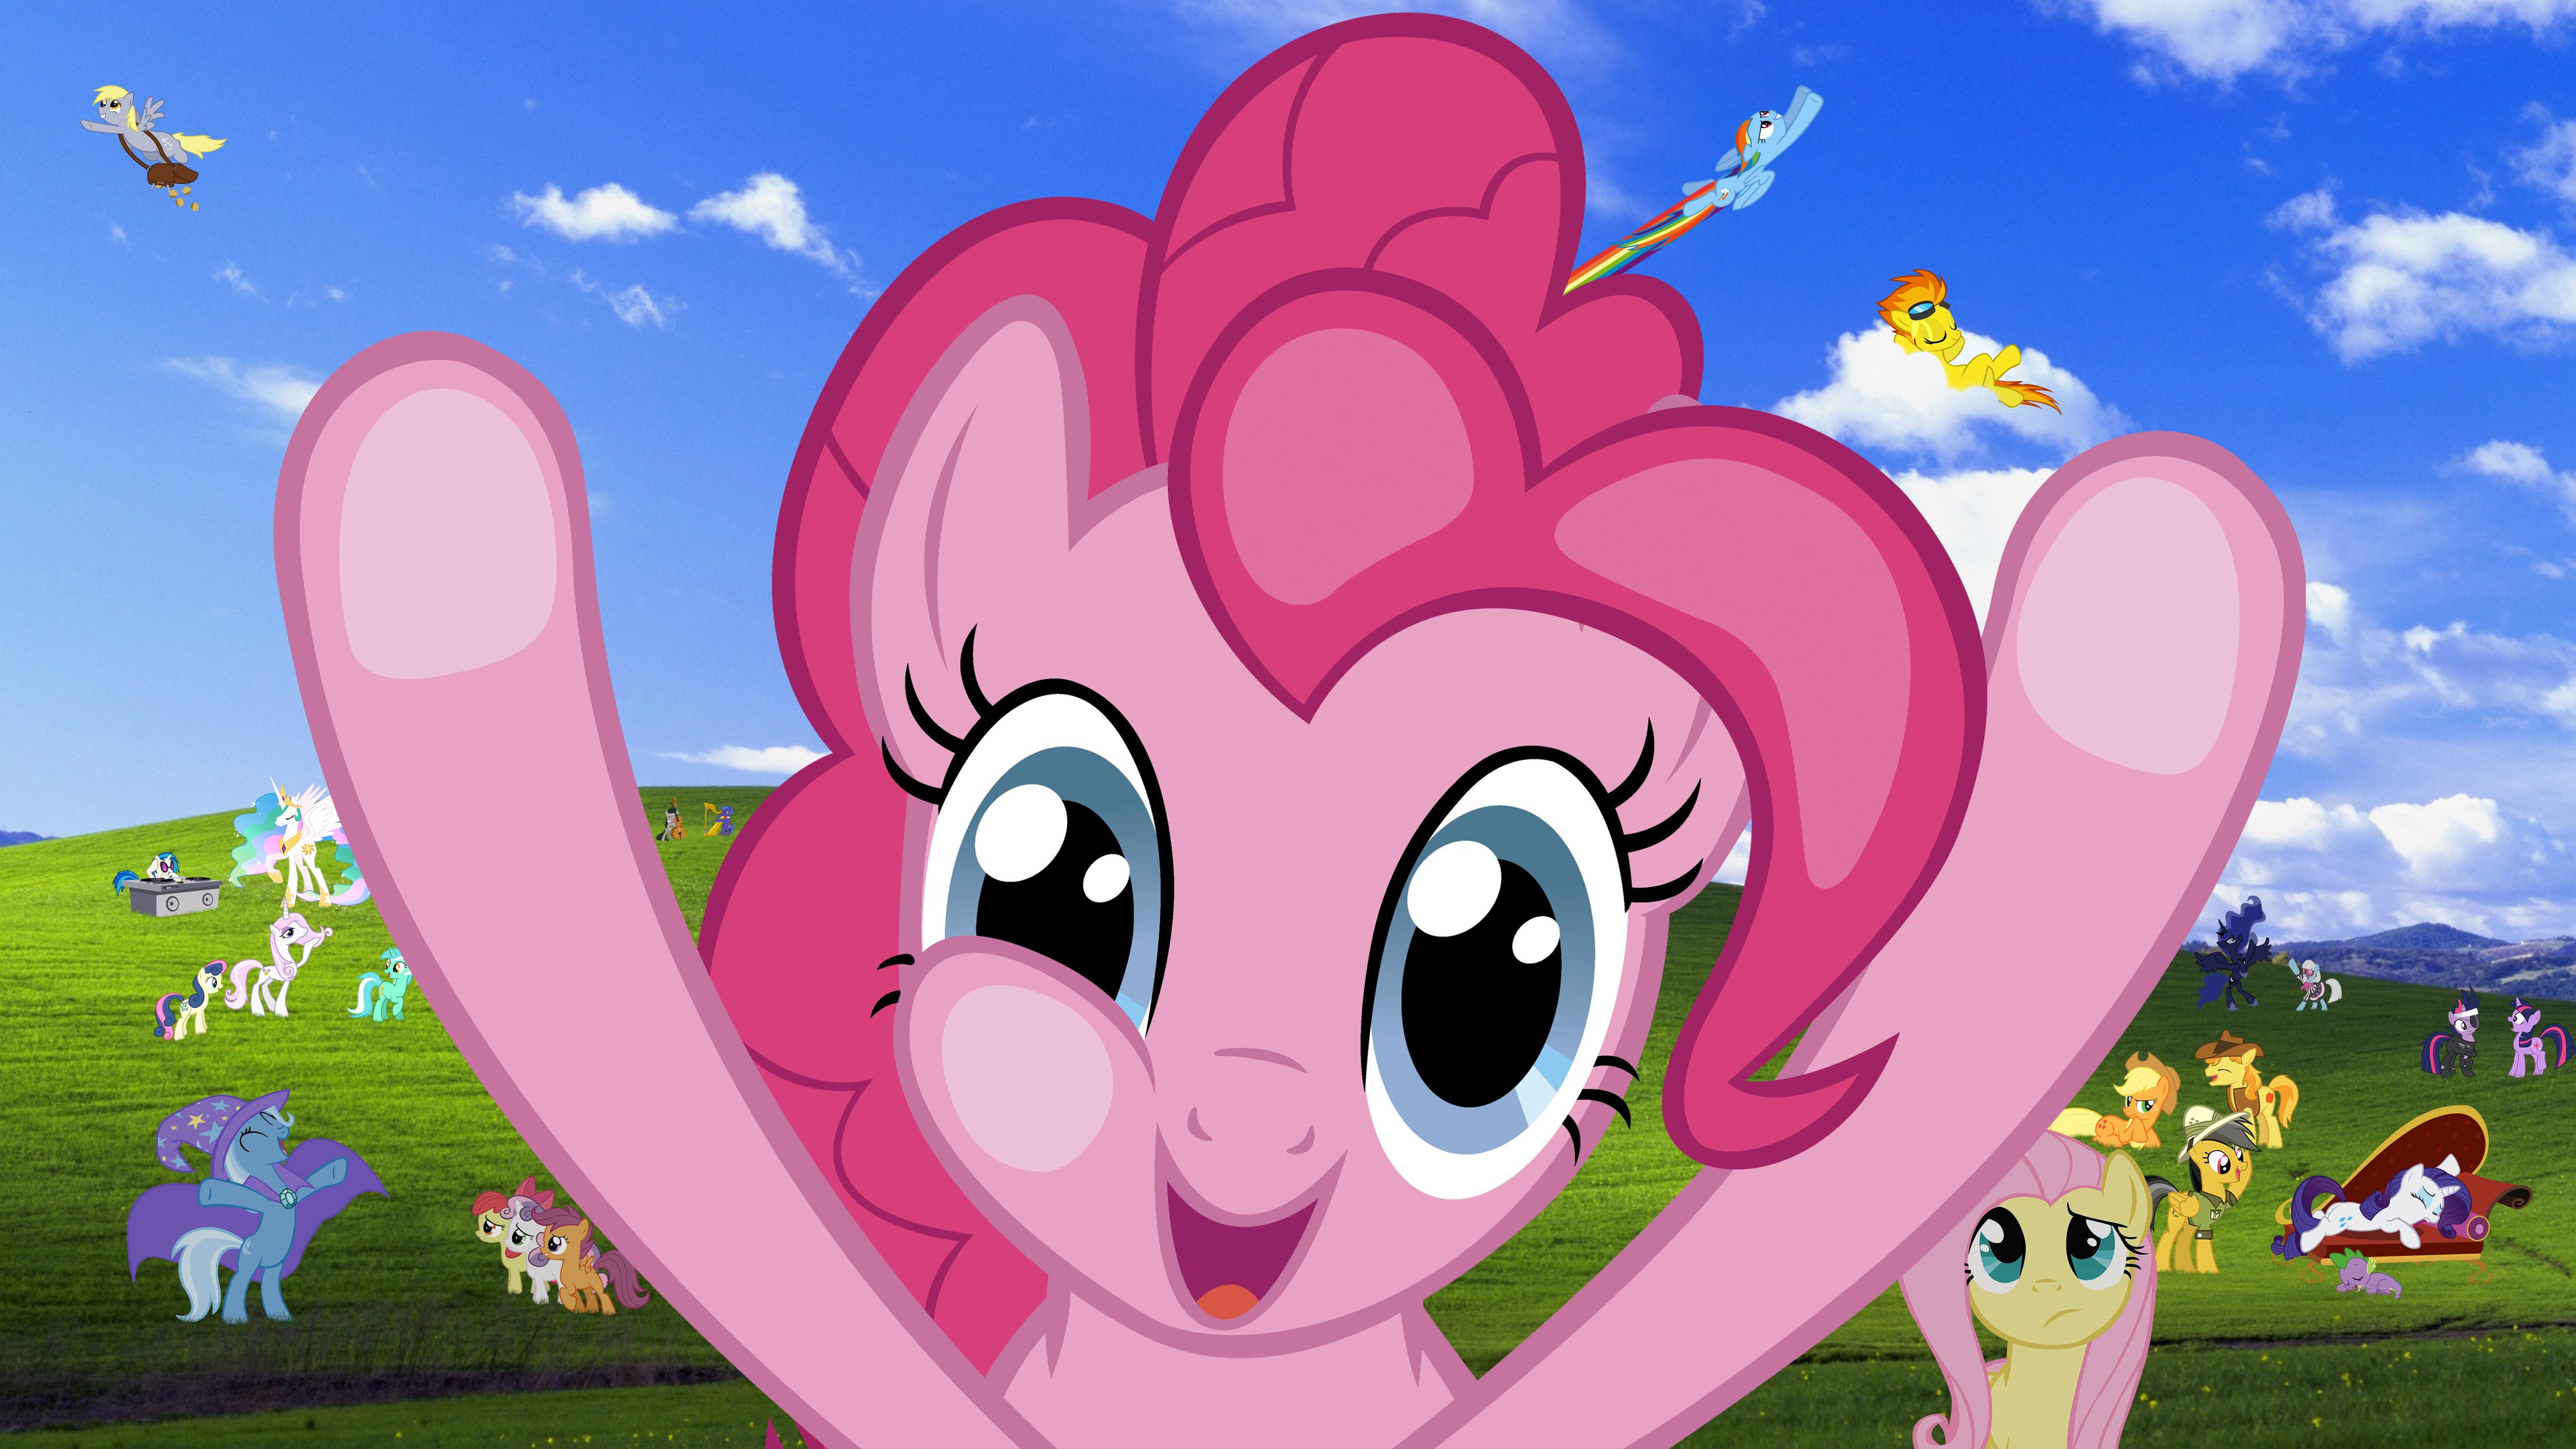 Windows Pony Wallpaper Pinkie Pie Version By RealBoser 4510x2537